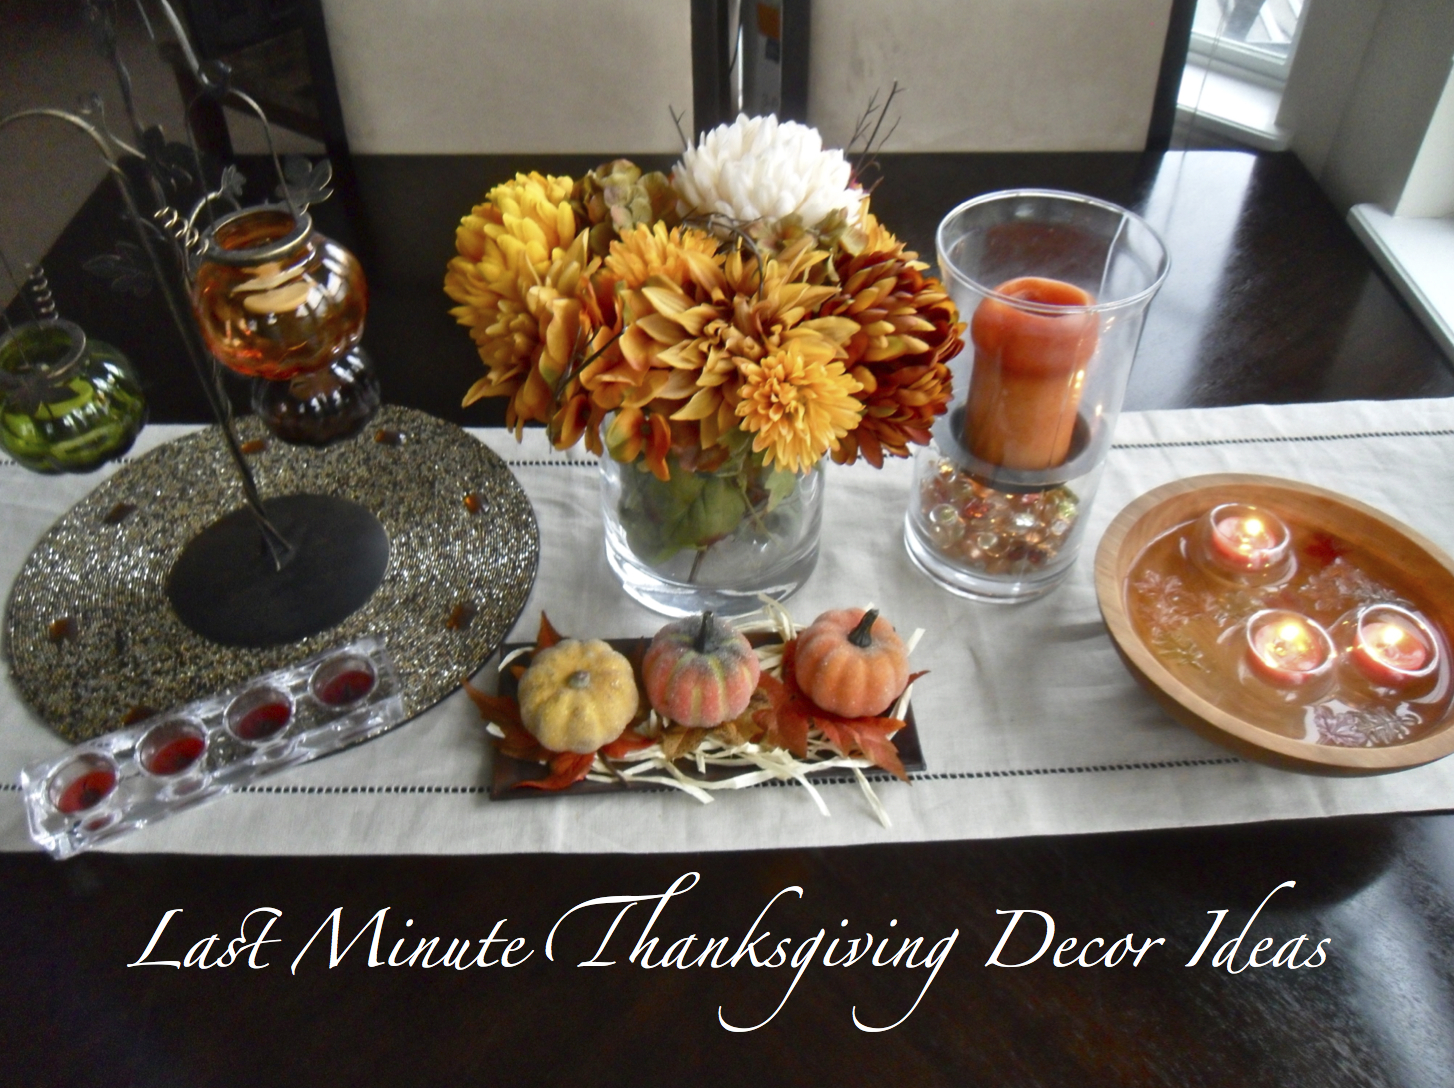 Last Minute Thanksgiving Decor Ideas